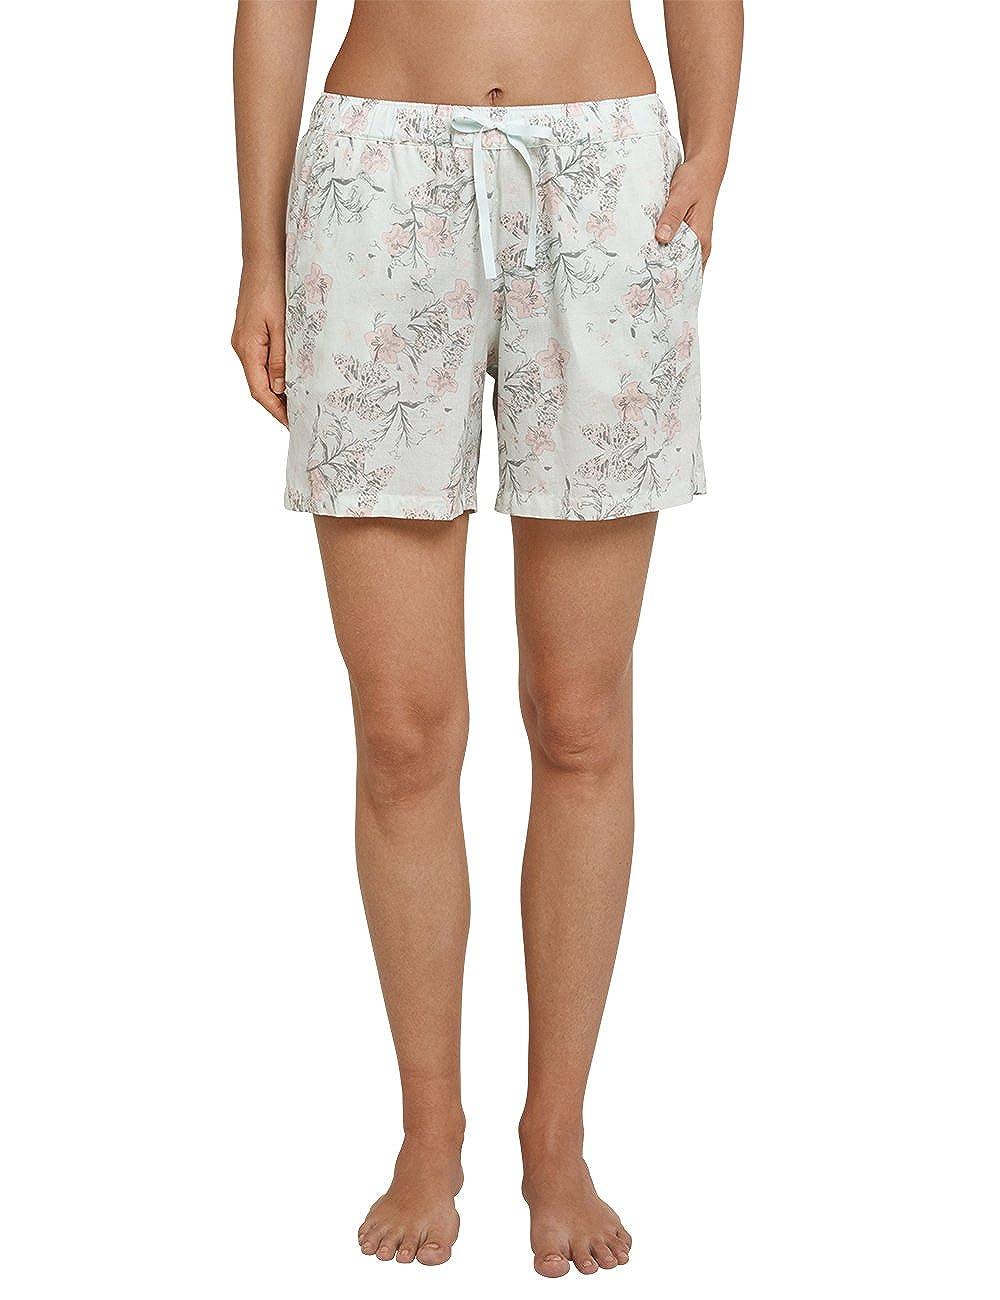 Schiesser Webhose Kurz, Pantalones de Pijama para Mujer